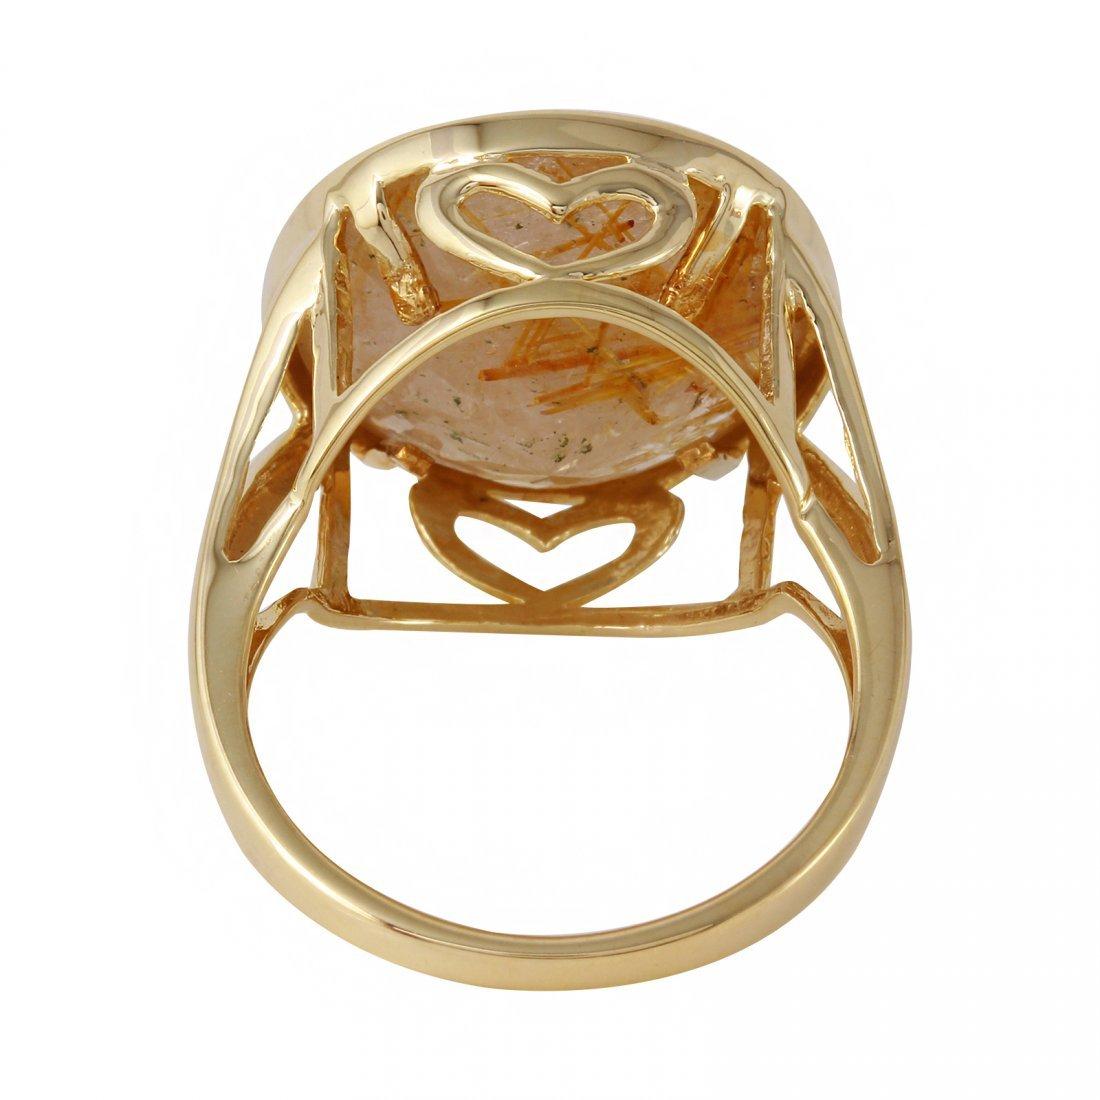 10K Yellow Gold Quartz Ring, 10 cts - 2